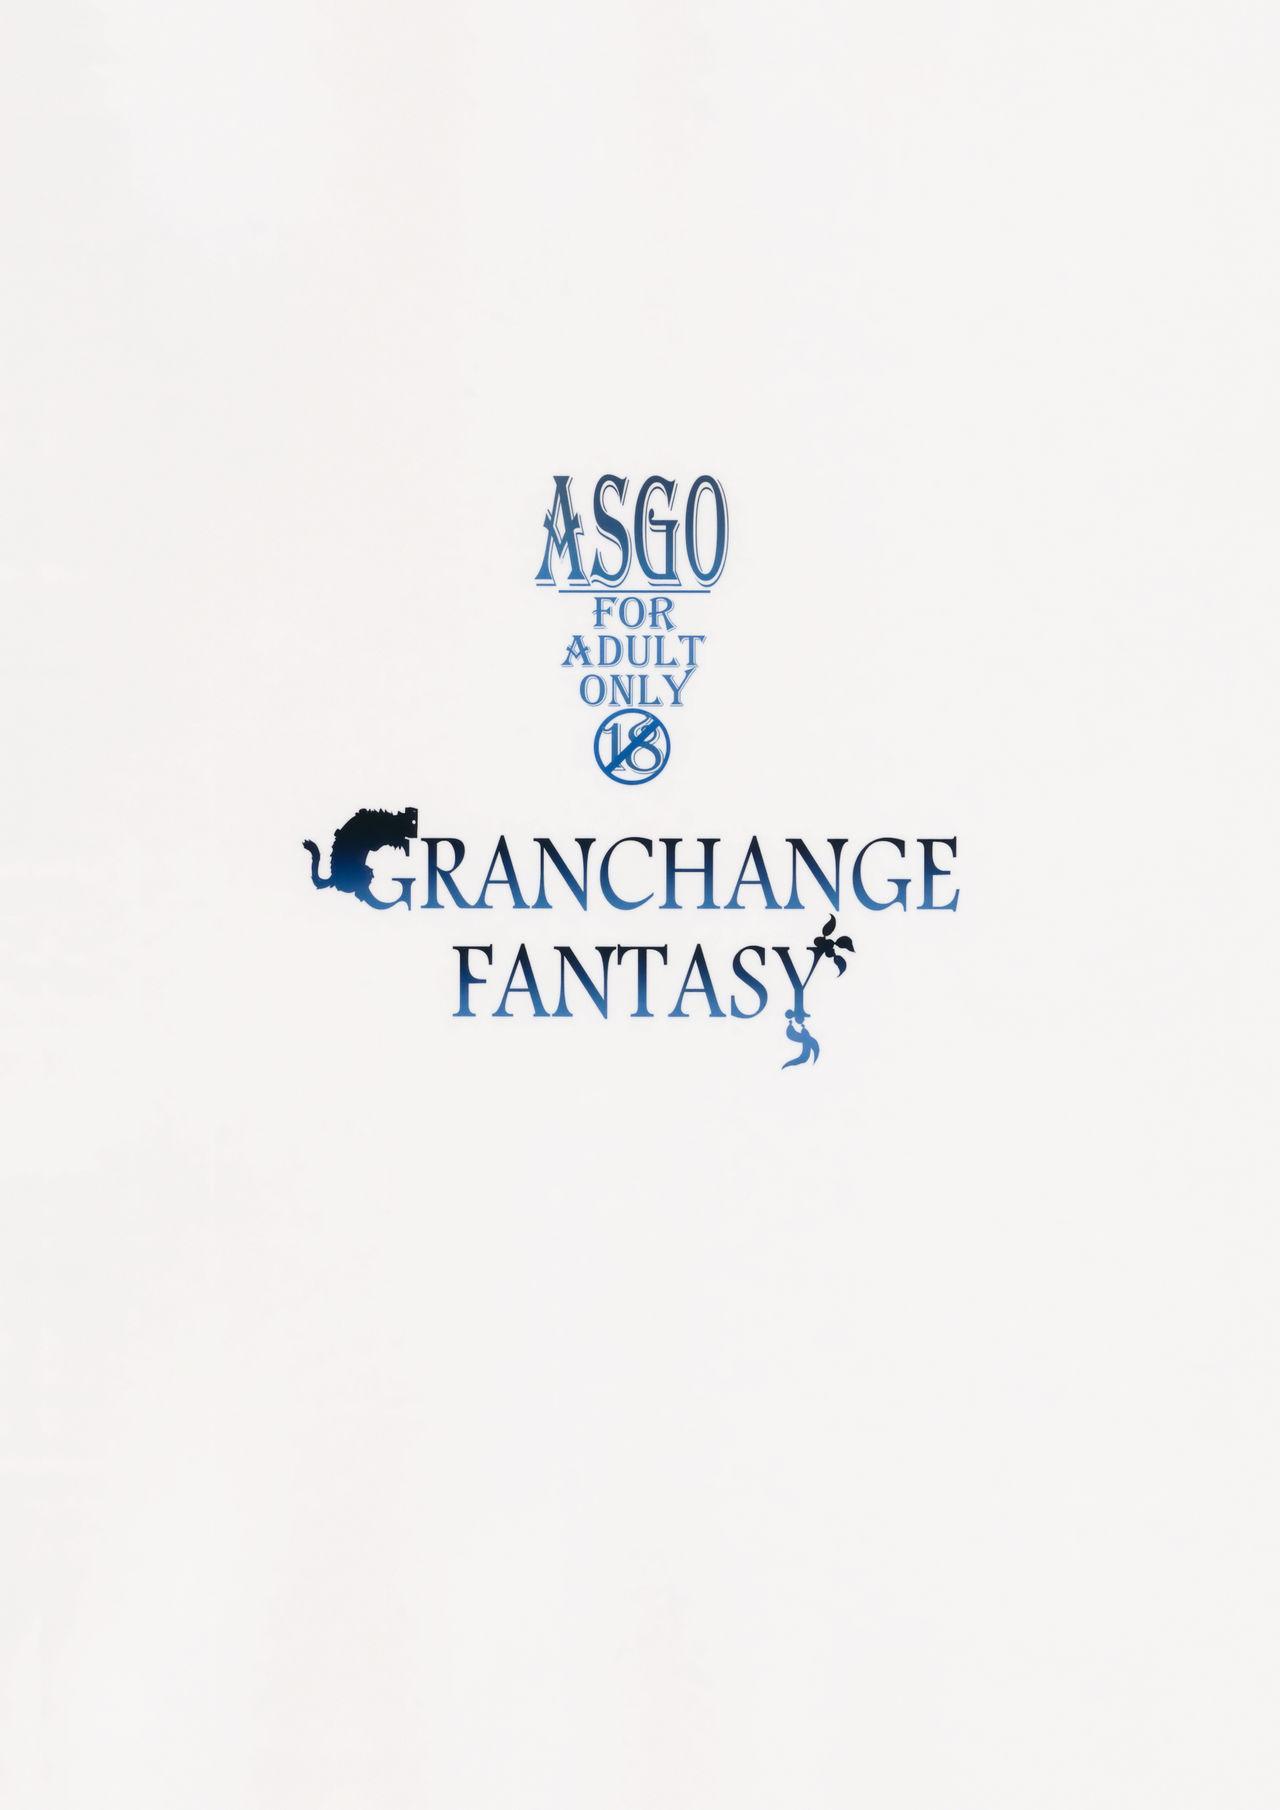 GRANCHANGE FANTASY 22